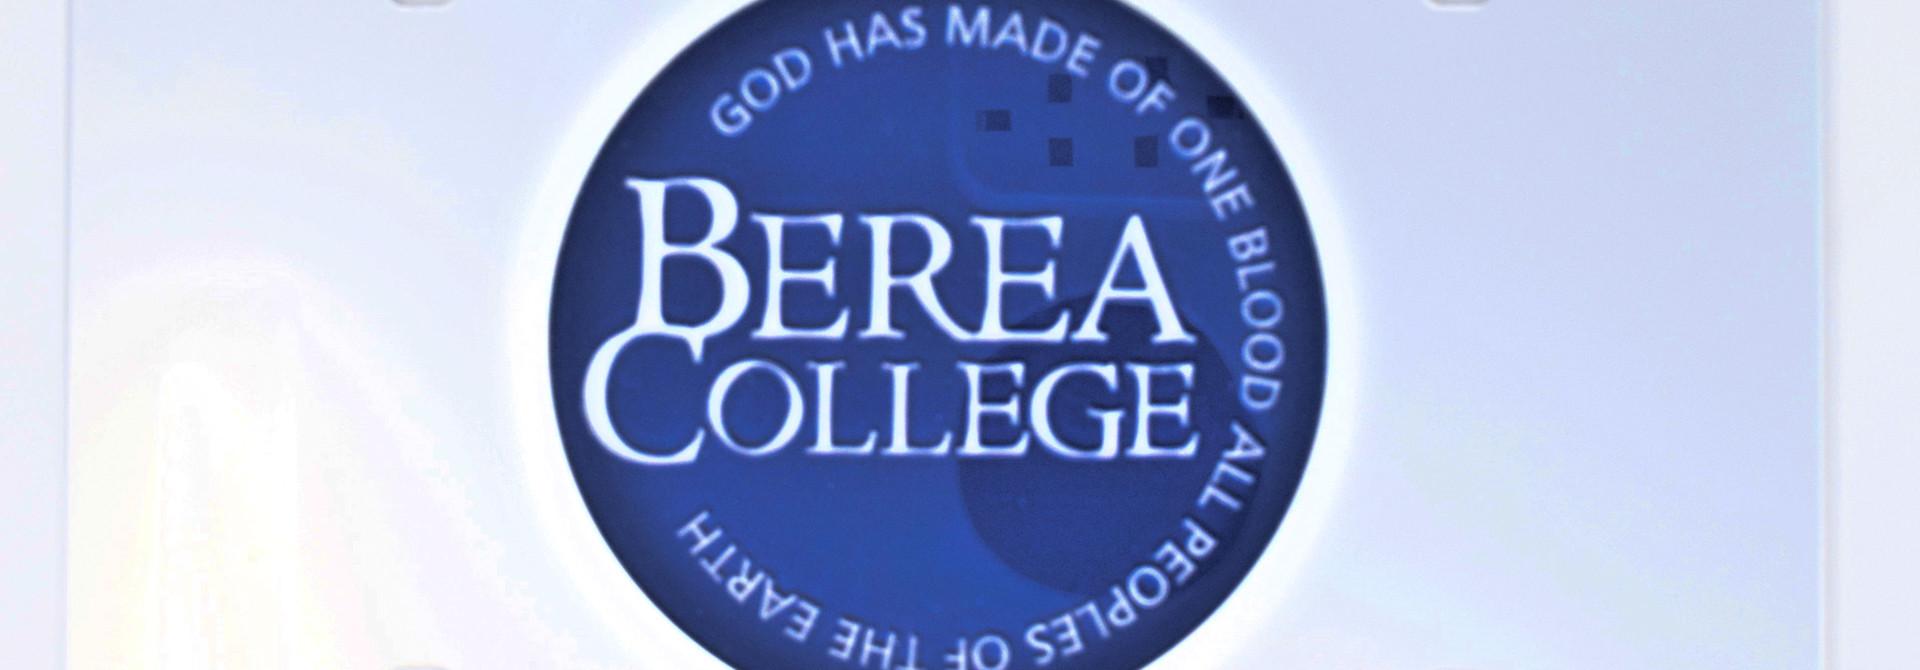 Circle Logo License Plate